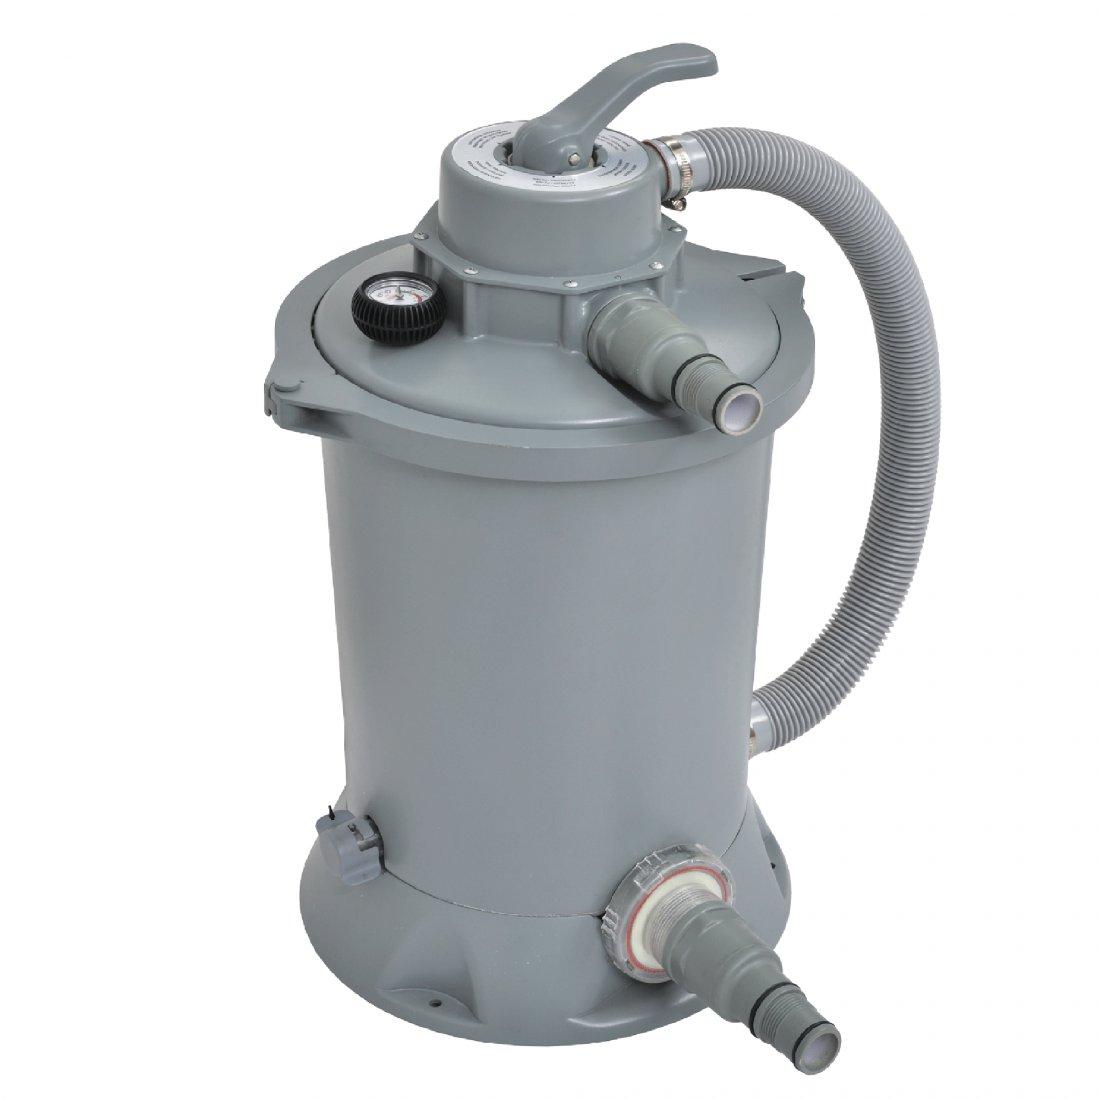 Jilong sand filter pump 800 pool sandfilter pumpe mit for Gunstige pools mit pumpe